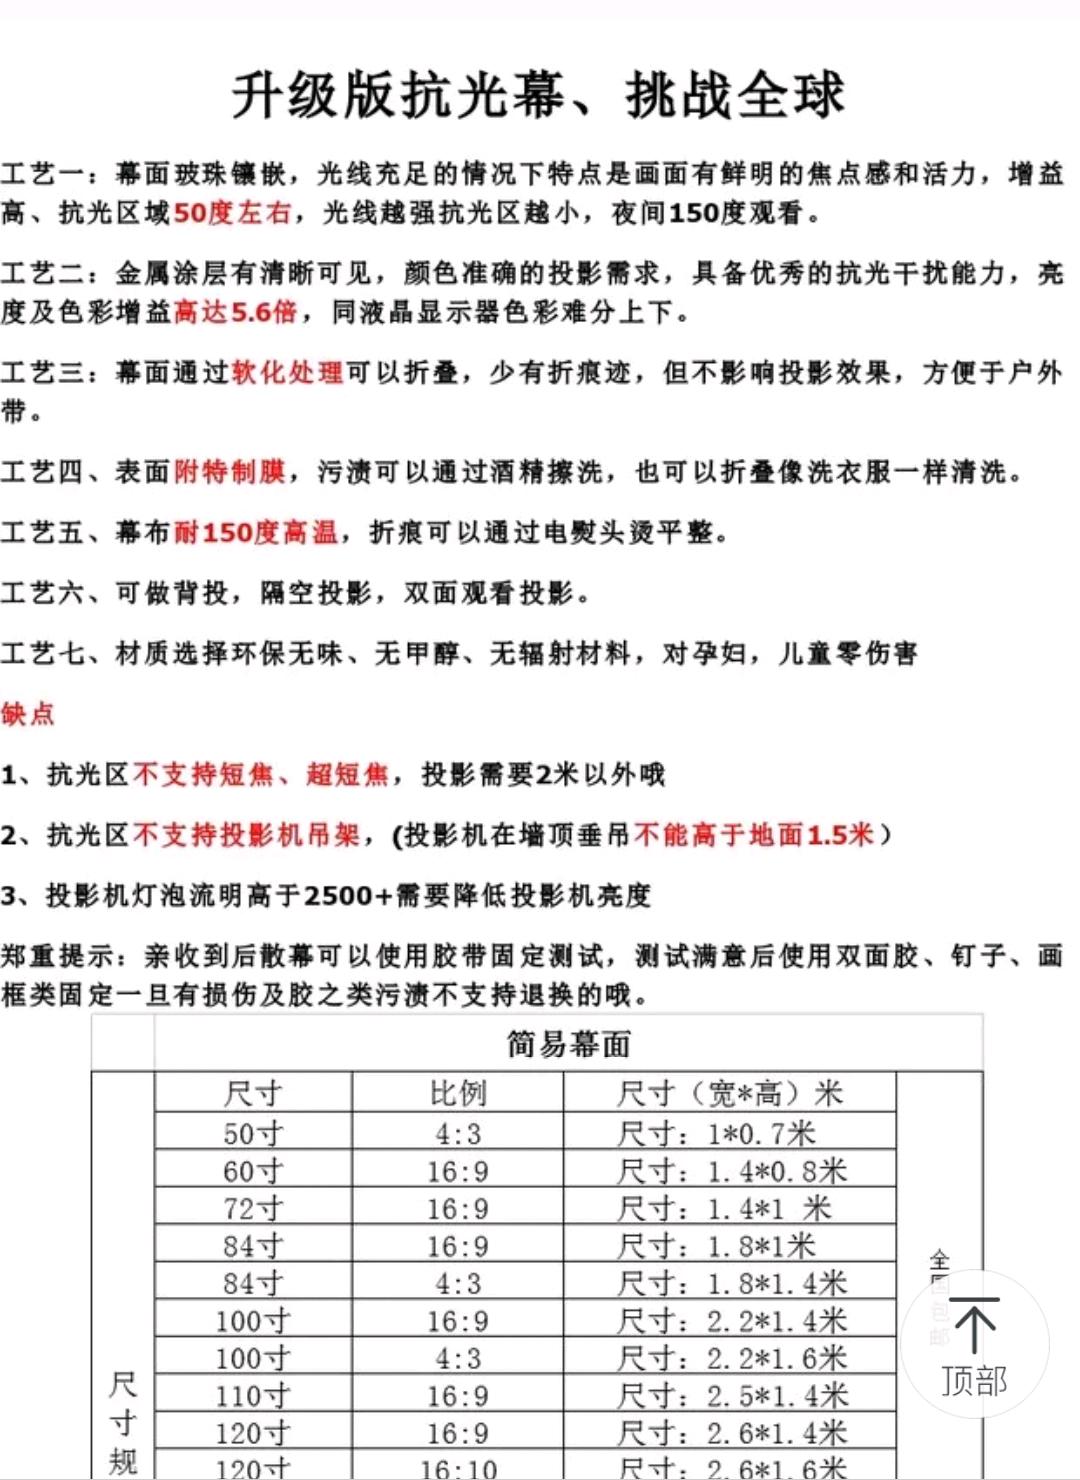 Screenshot_2018-06-12-14-53-20.png